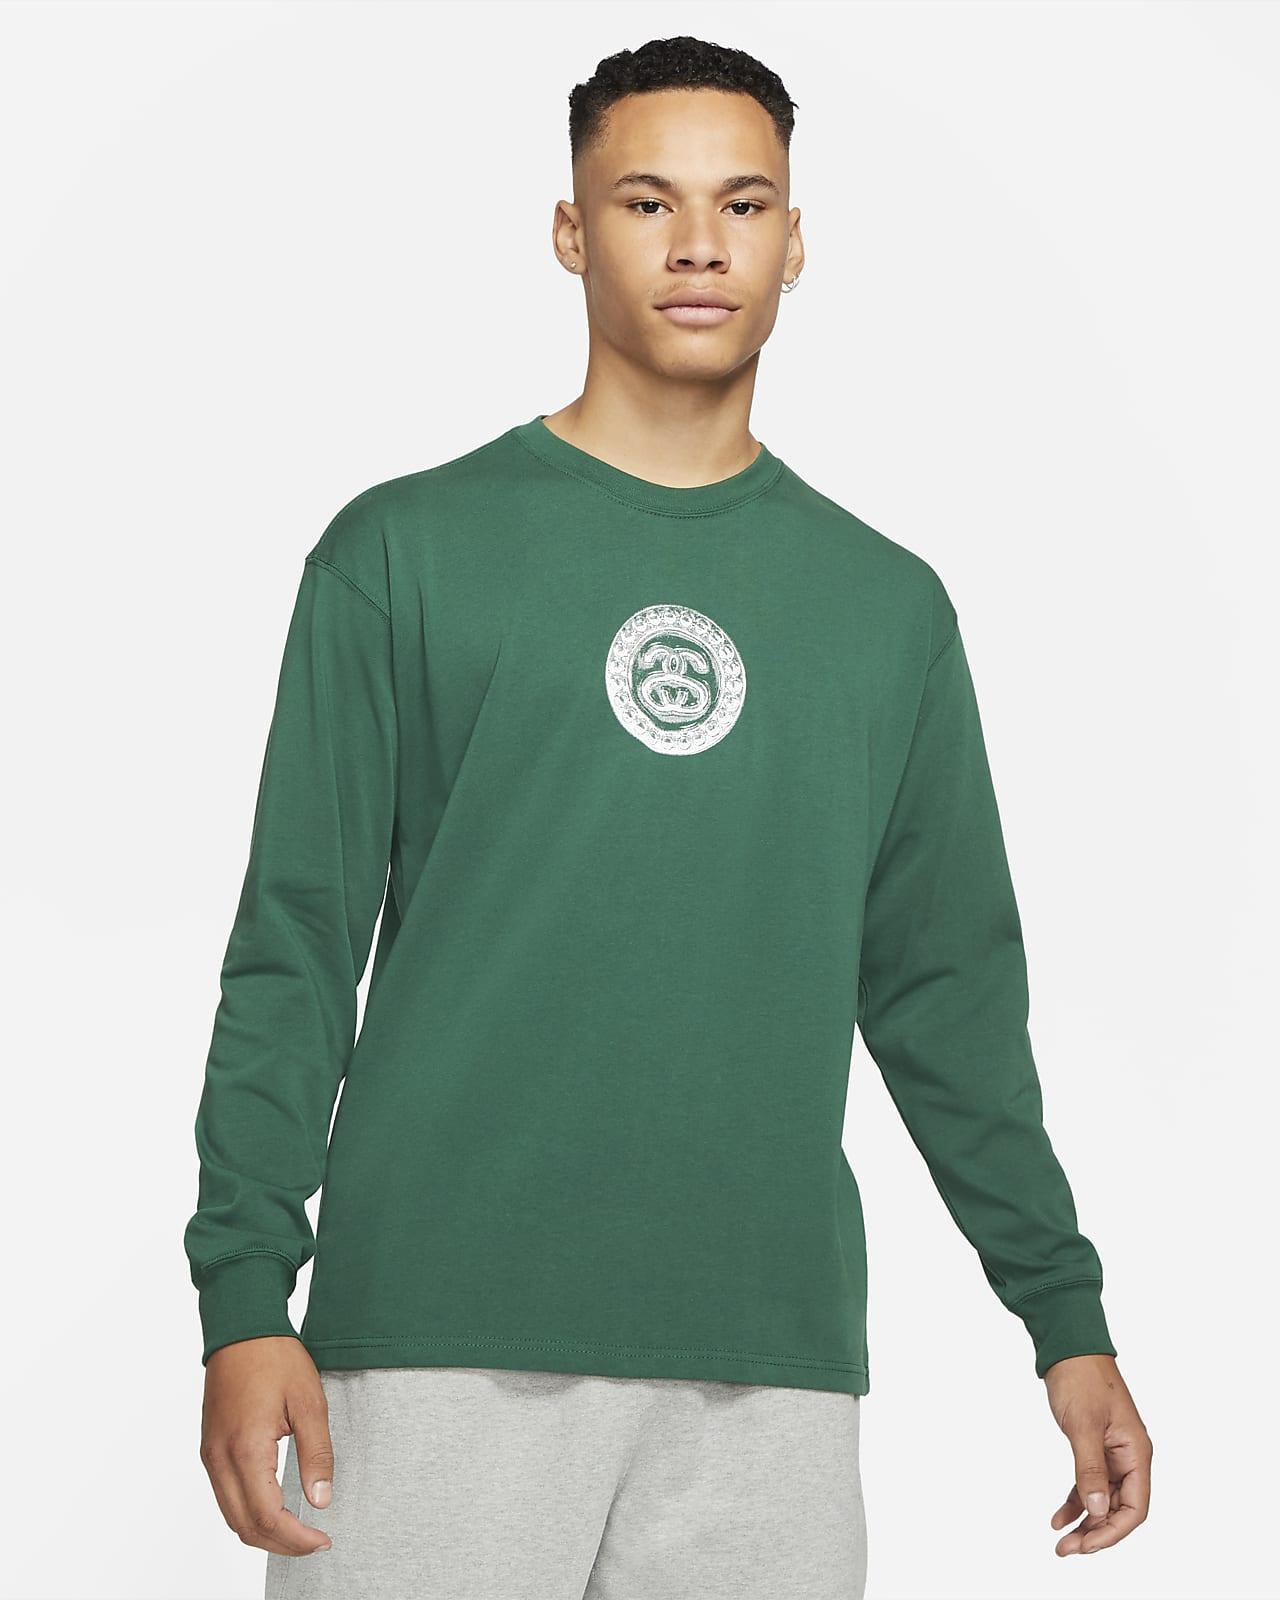 Nike x Stüssy Long-Sleeve T-Shirt